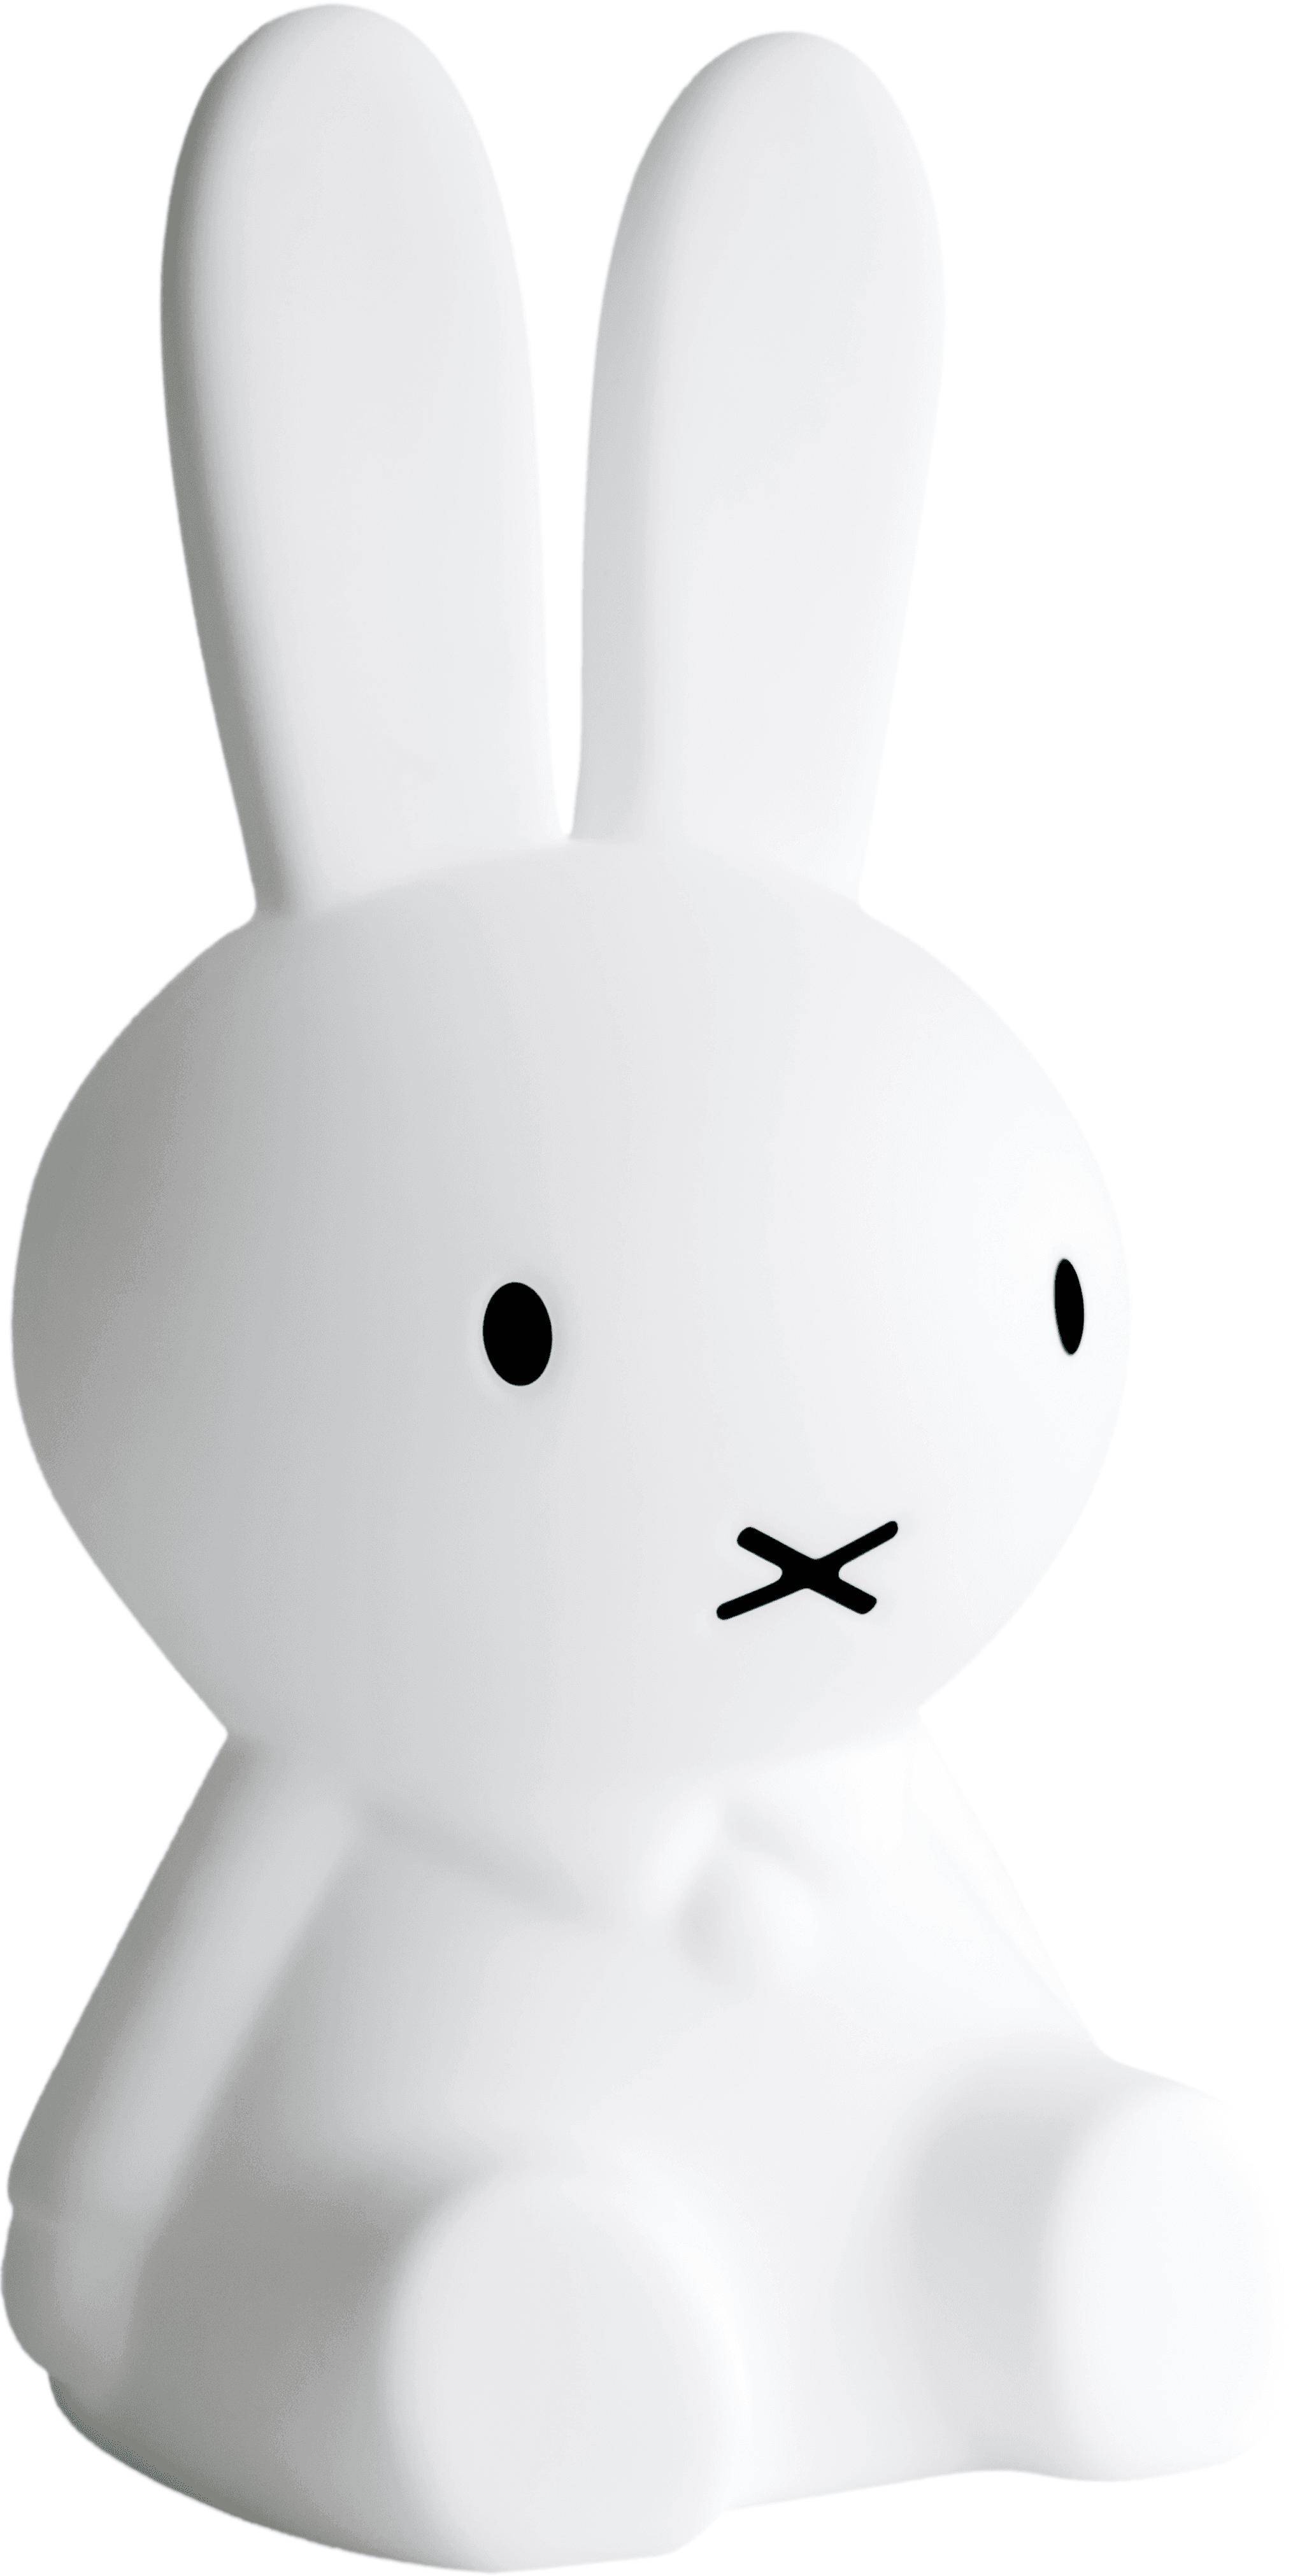 LED Bodenleuchte Miffy, Polyethylen, Weiss, 25 x 50 cm